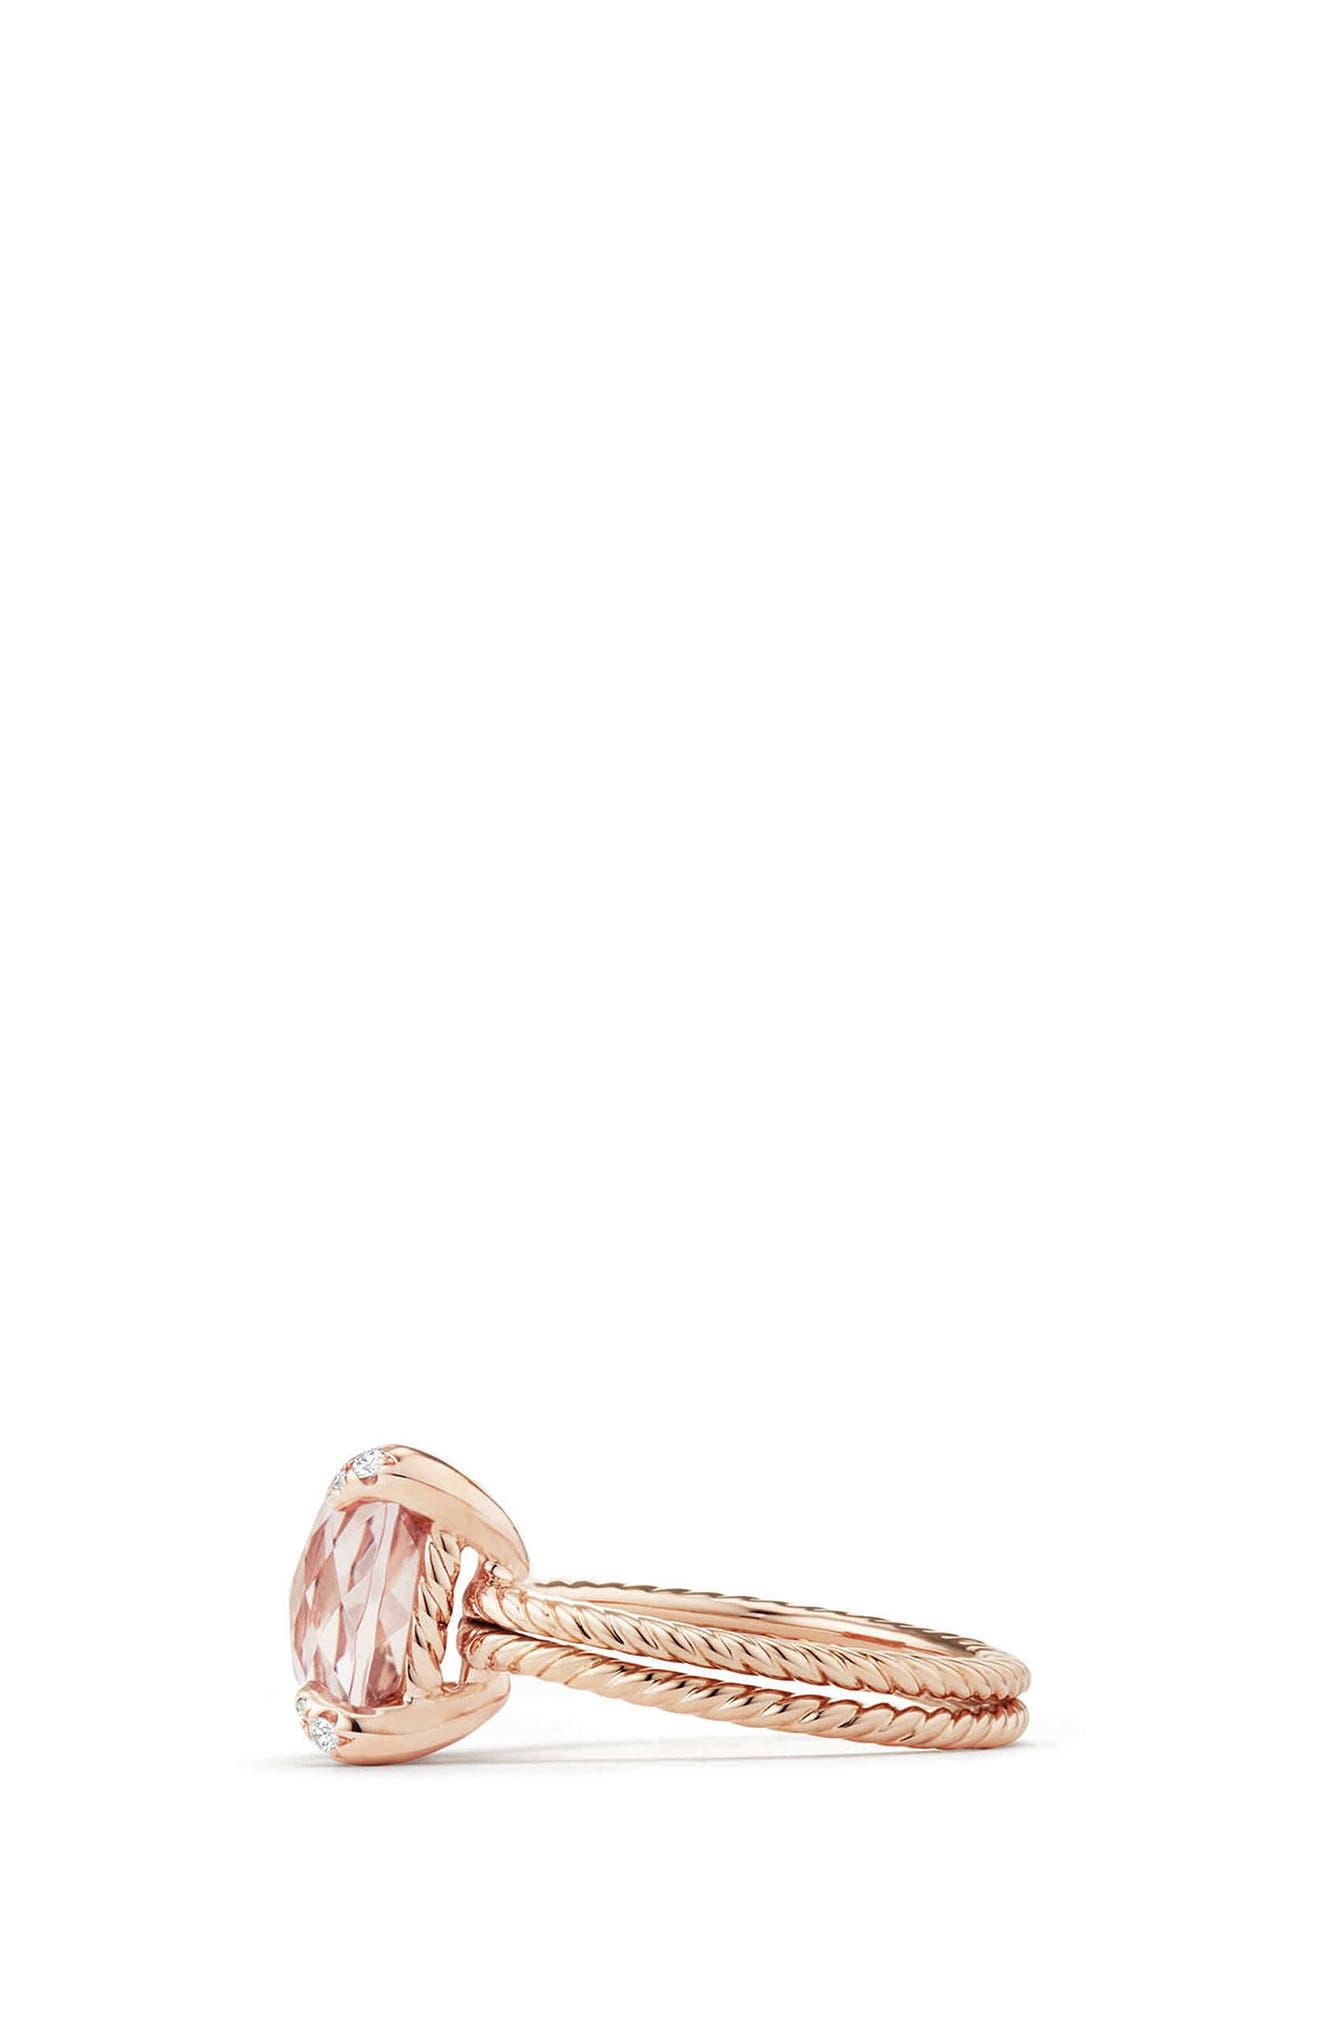 Chatelaine<sup>®</sup> Morganite & Diamond Ring in 18K Rose Gold,                             Alternate thumbnail 2, color,                             Rose Gold/ Diamond/ Morganite